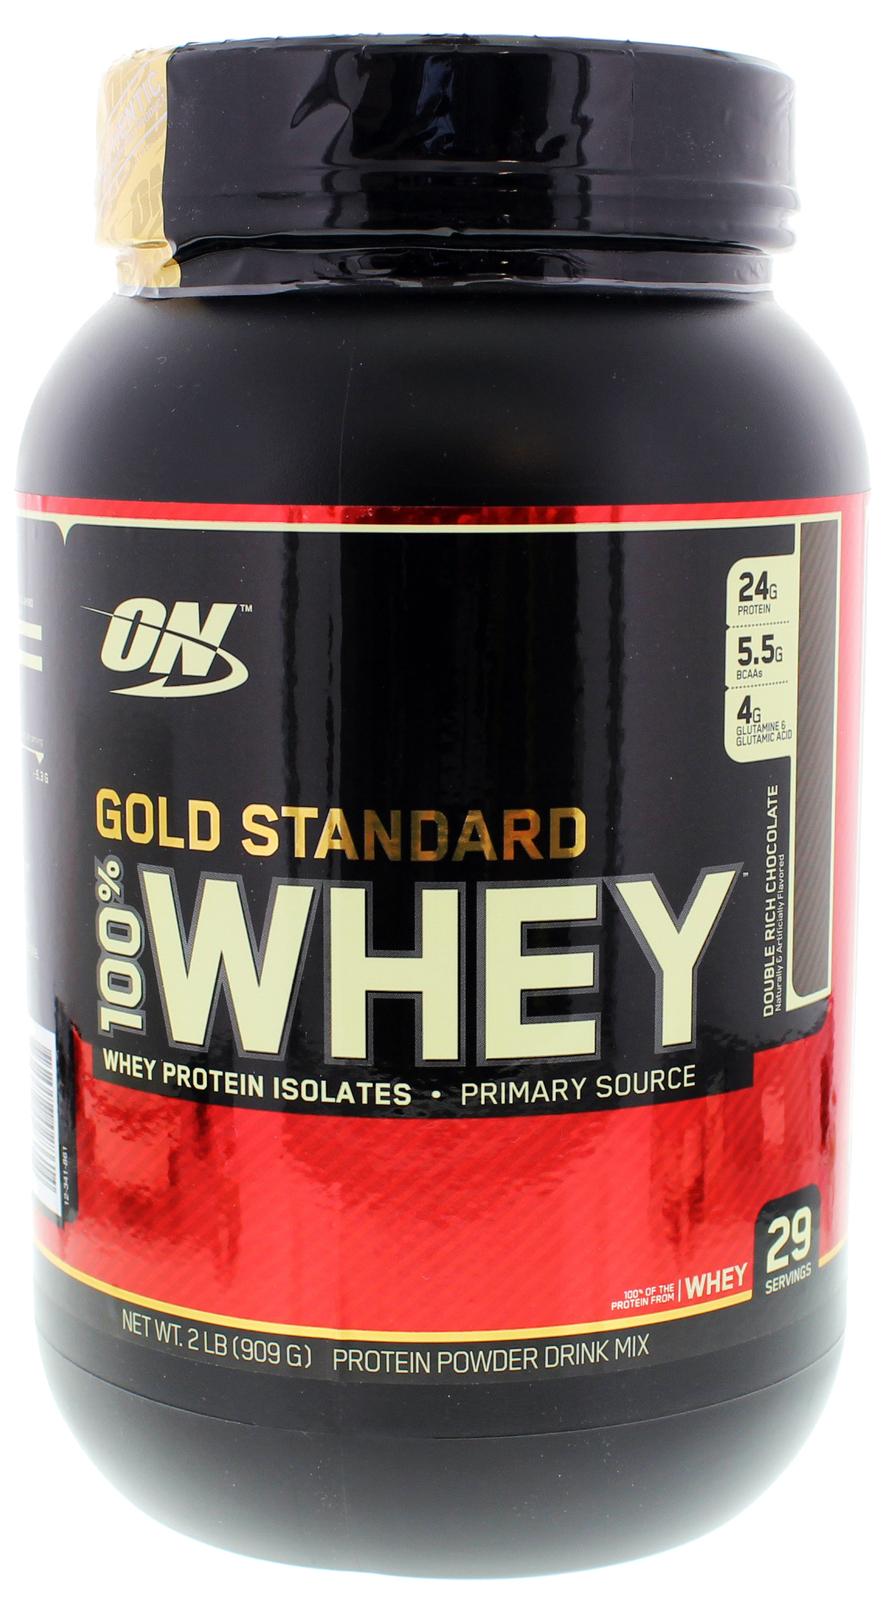 Optimum nutrition gold standard chocolate